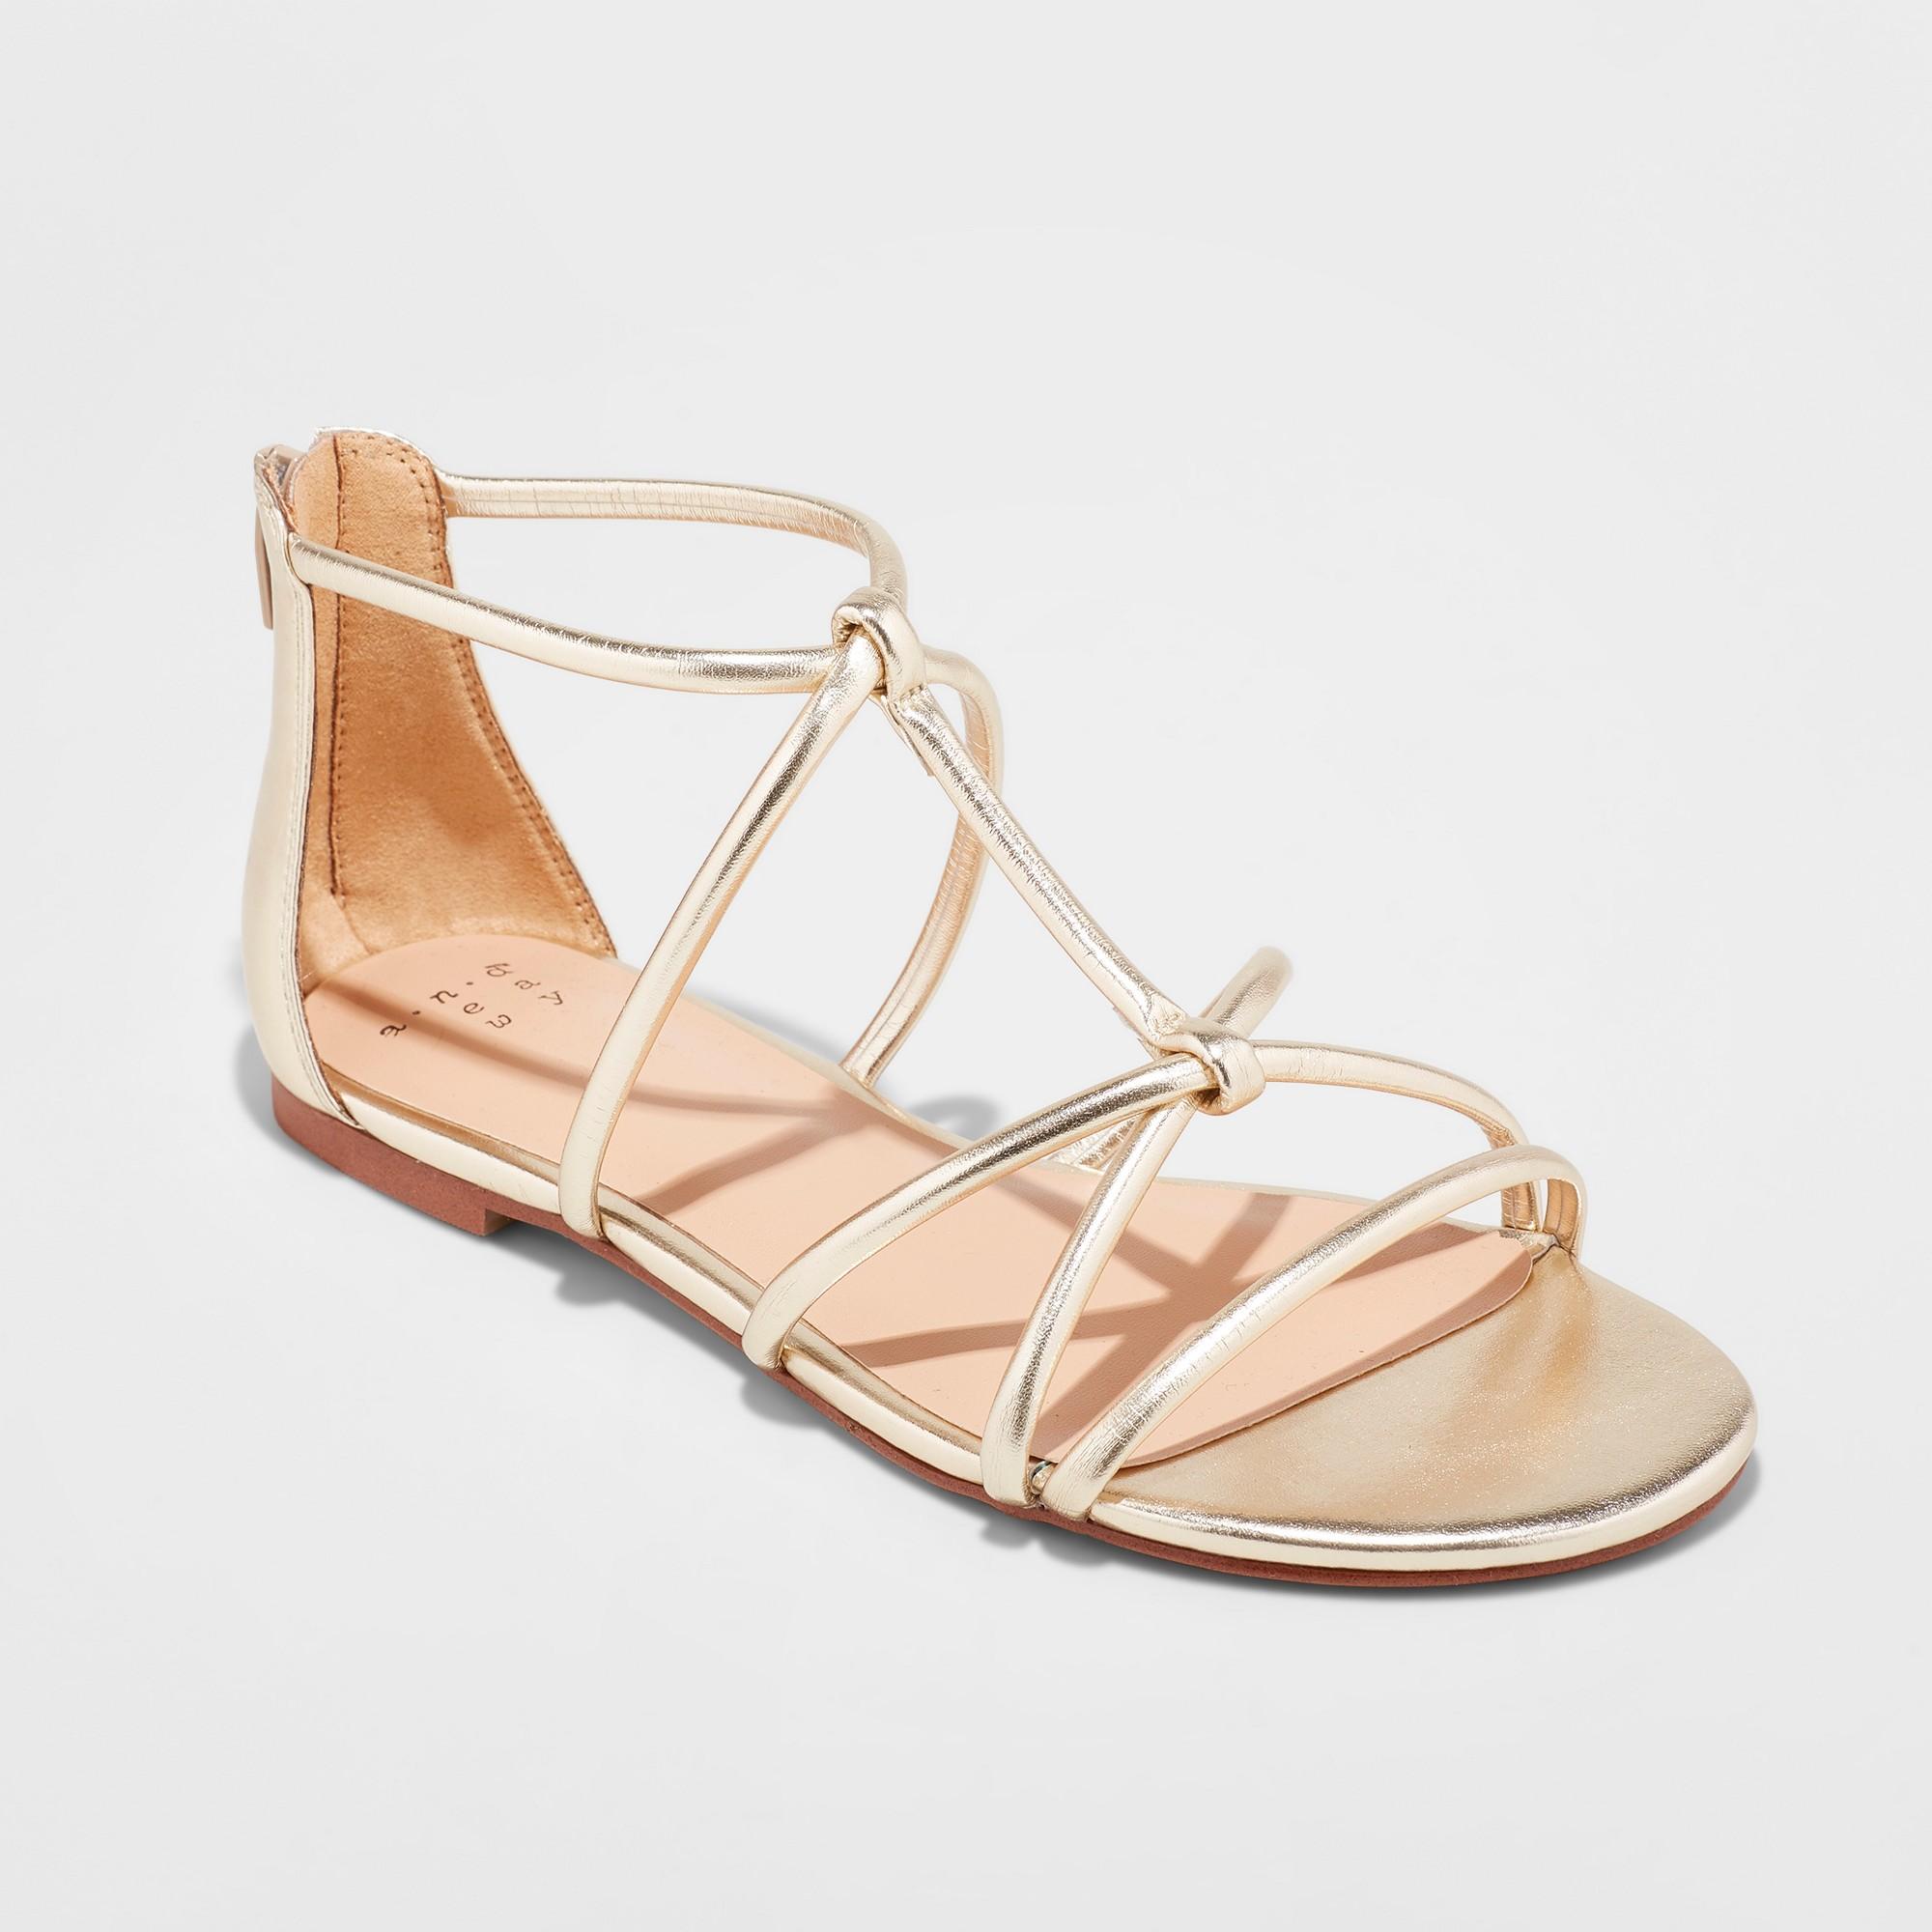 gladiator sandals, Gladiator sandals